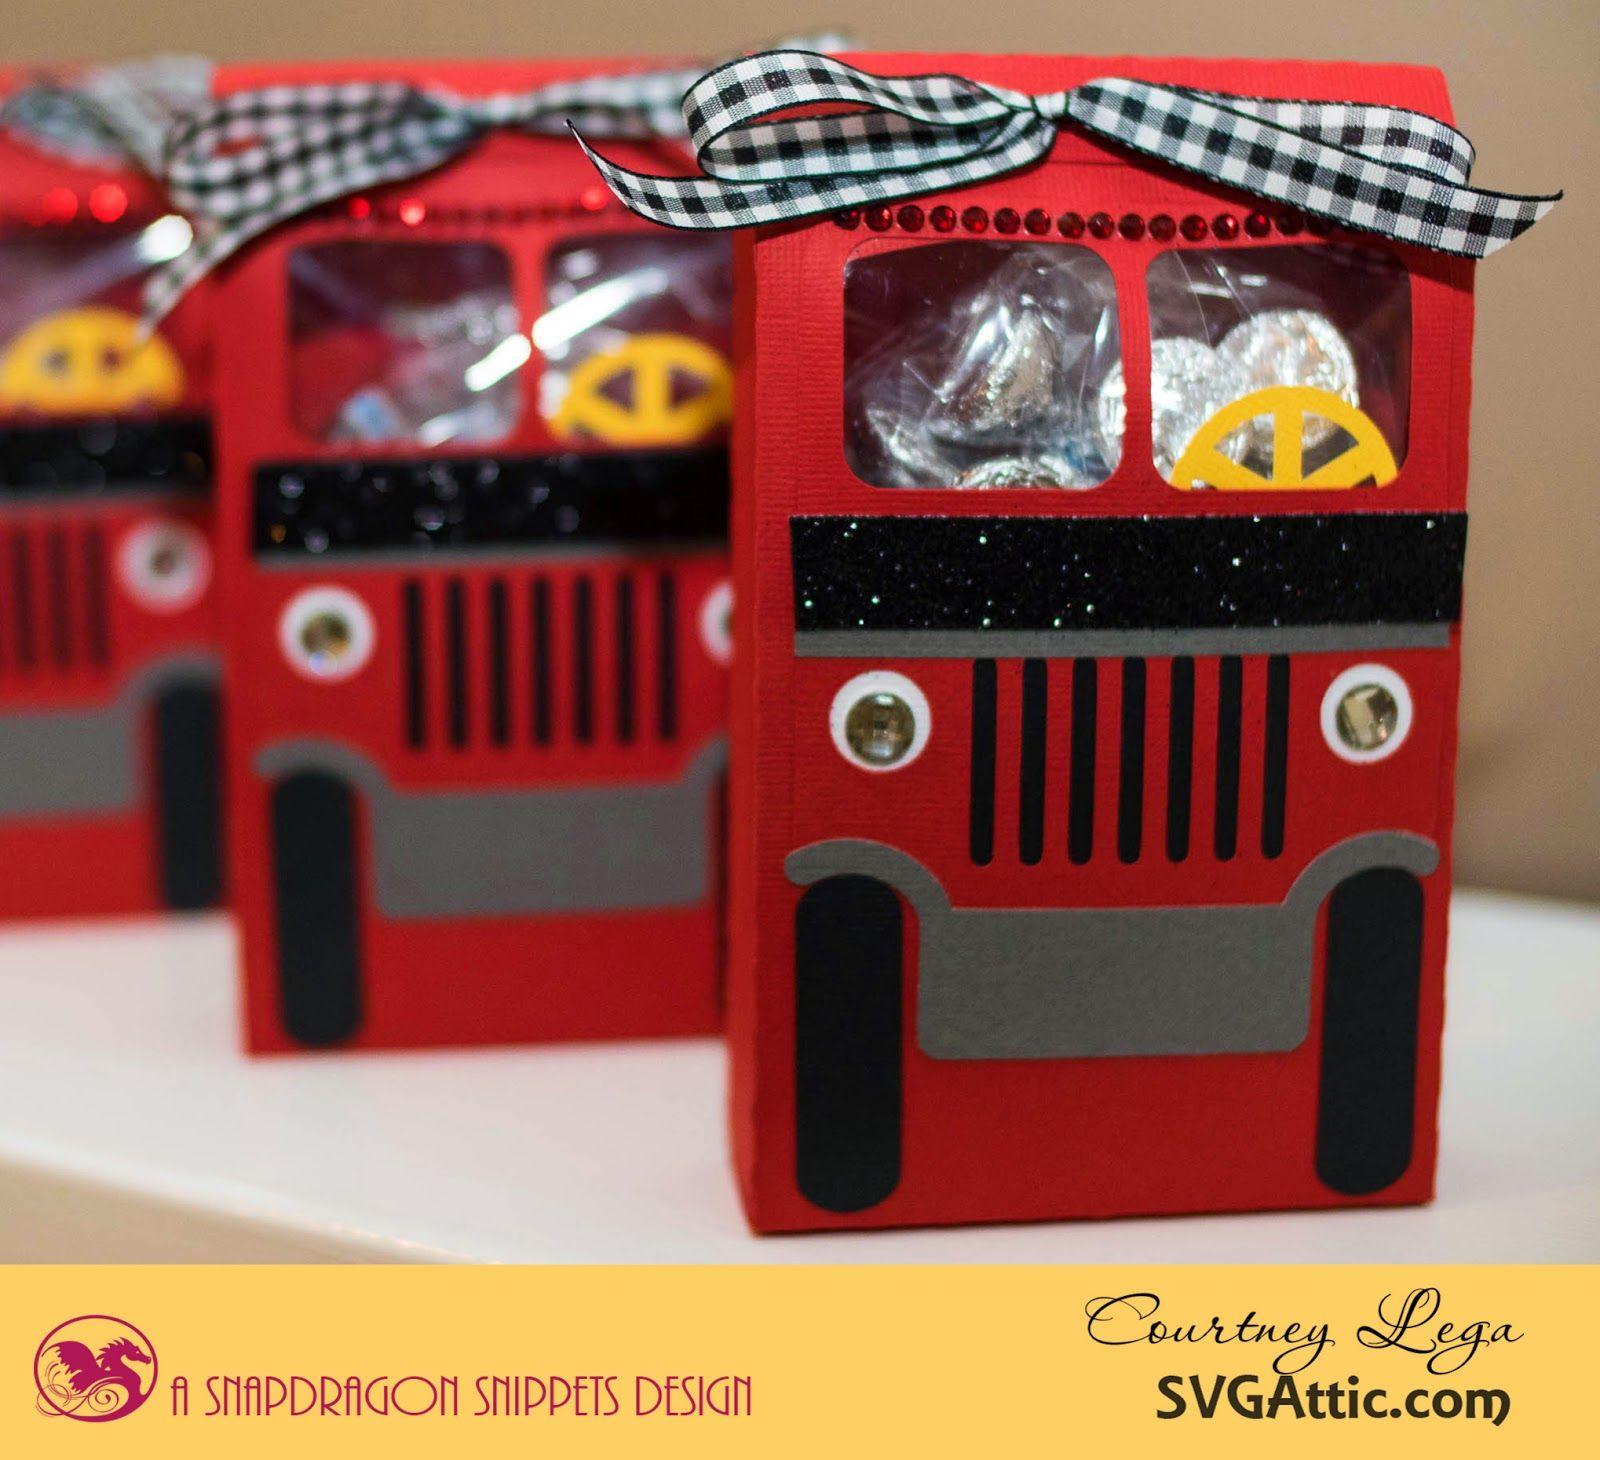 SVG Attic Blog Sound the Alarm Firetruck Treat Bags